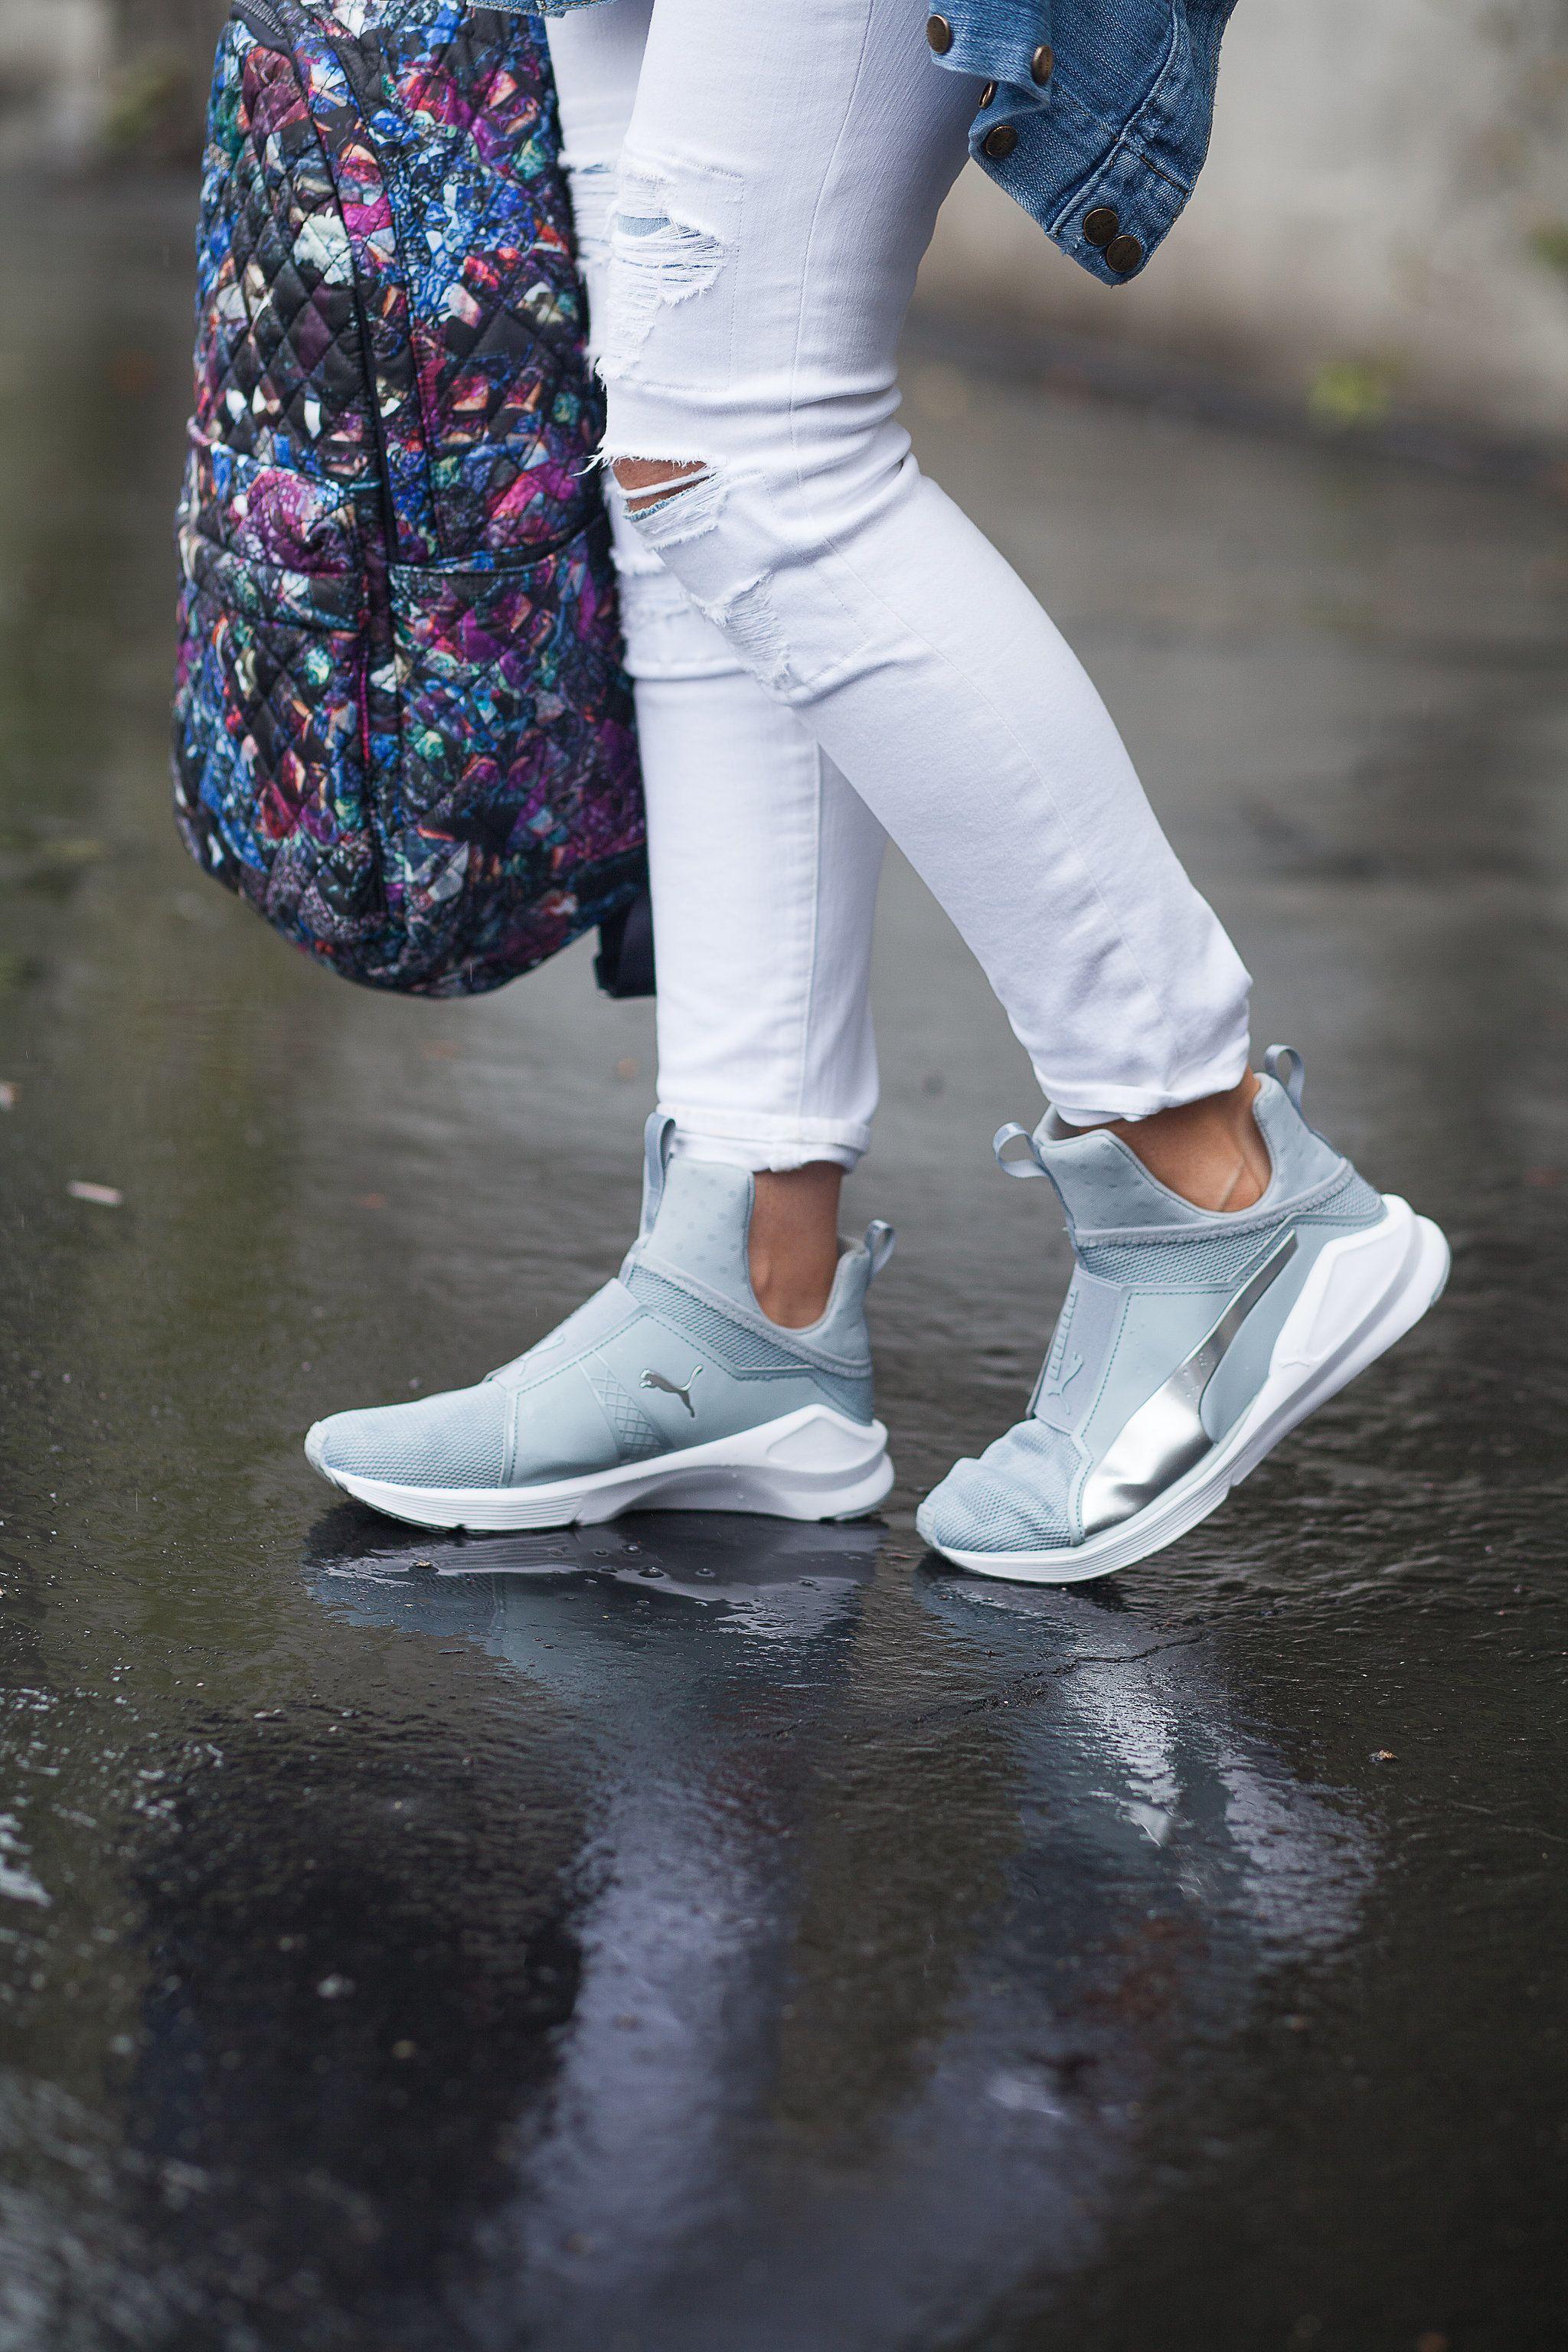 e2b6a0460d84 sneaker trends by PUMA fierce